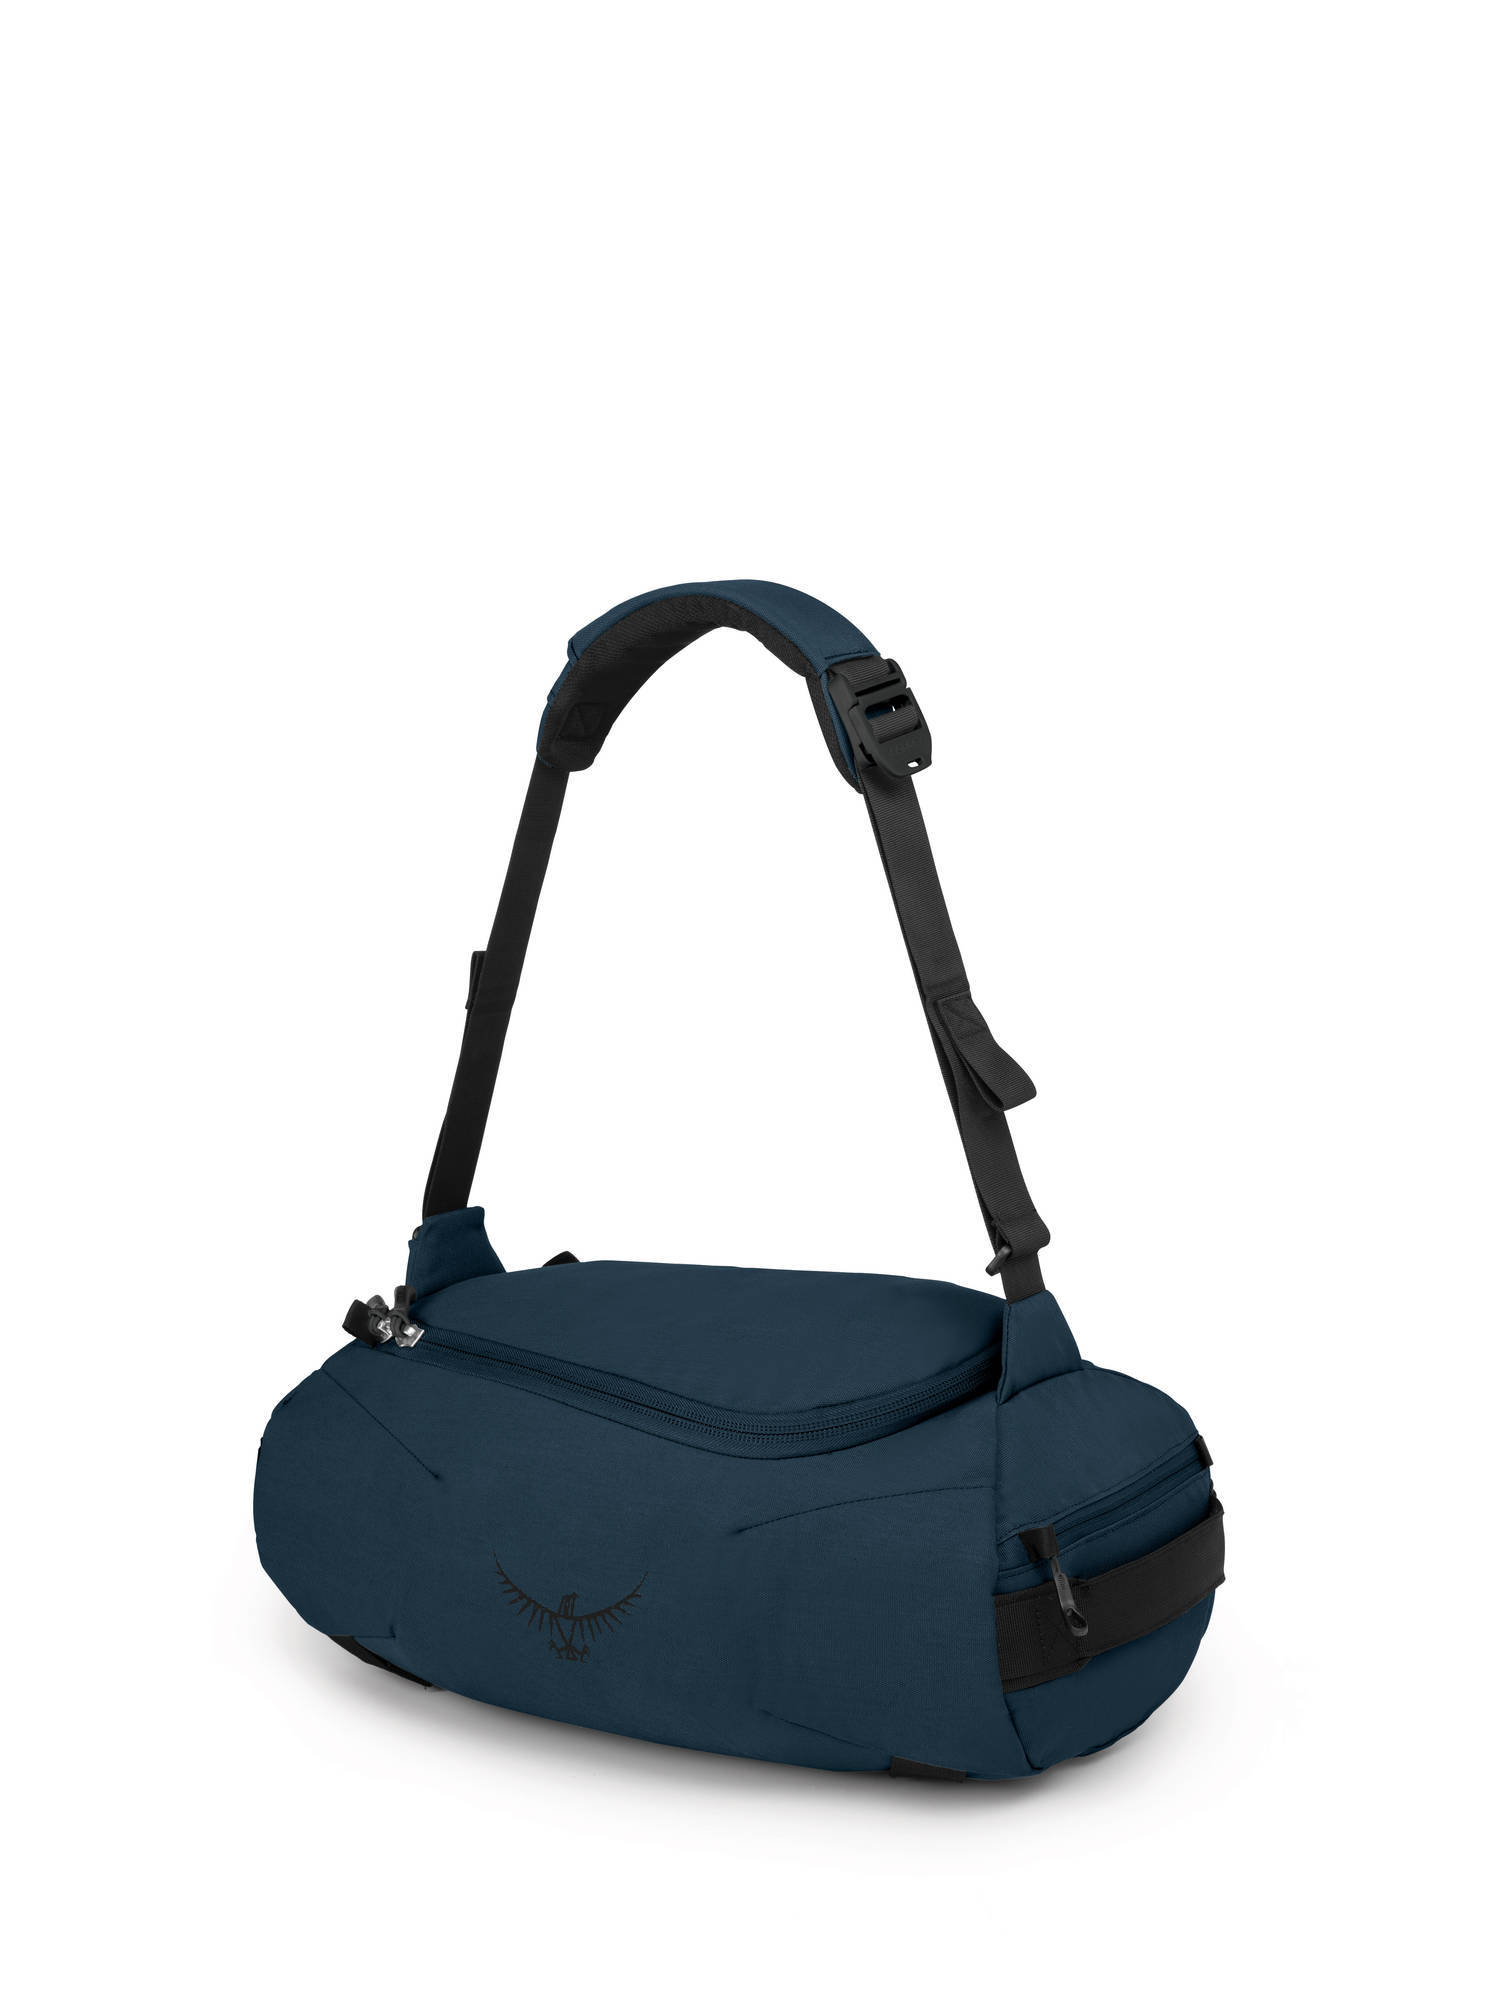 Сумки-рюкзаки Сумка Osprey Trillium 30 Duffel Vega Blue Trillium_30_F17_Side_Vega_Blue_web.jpg